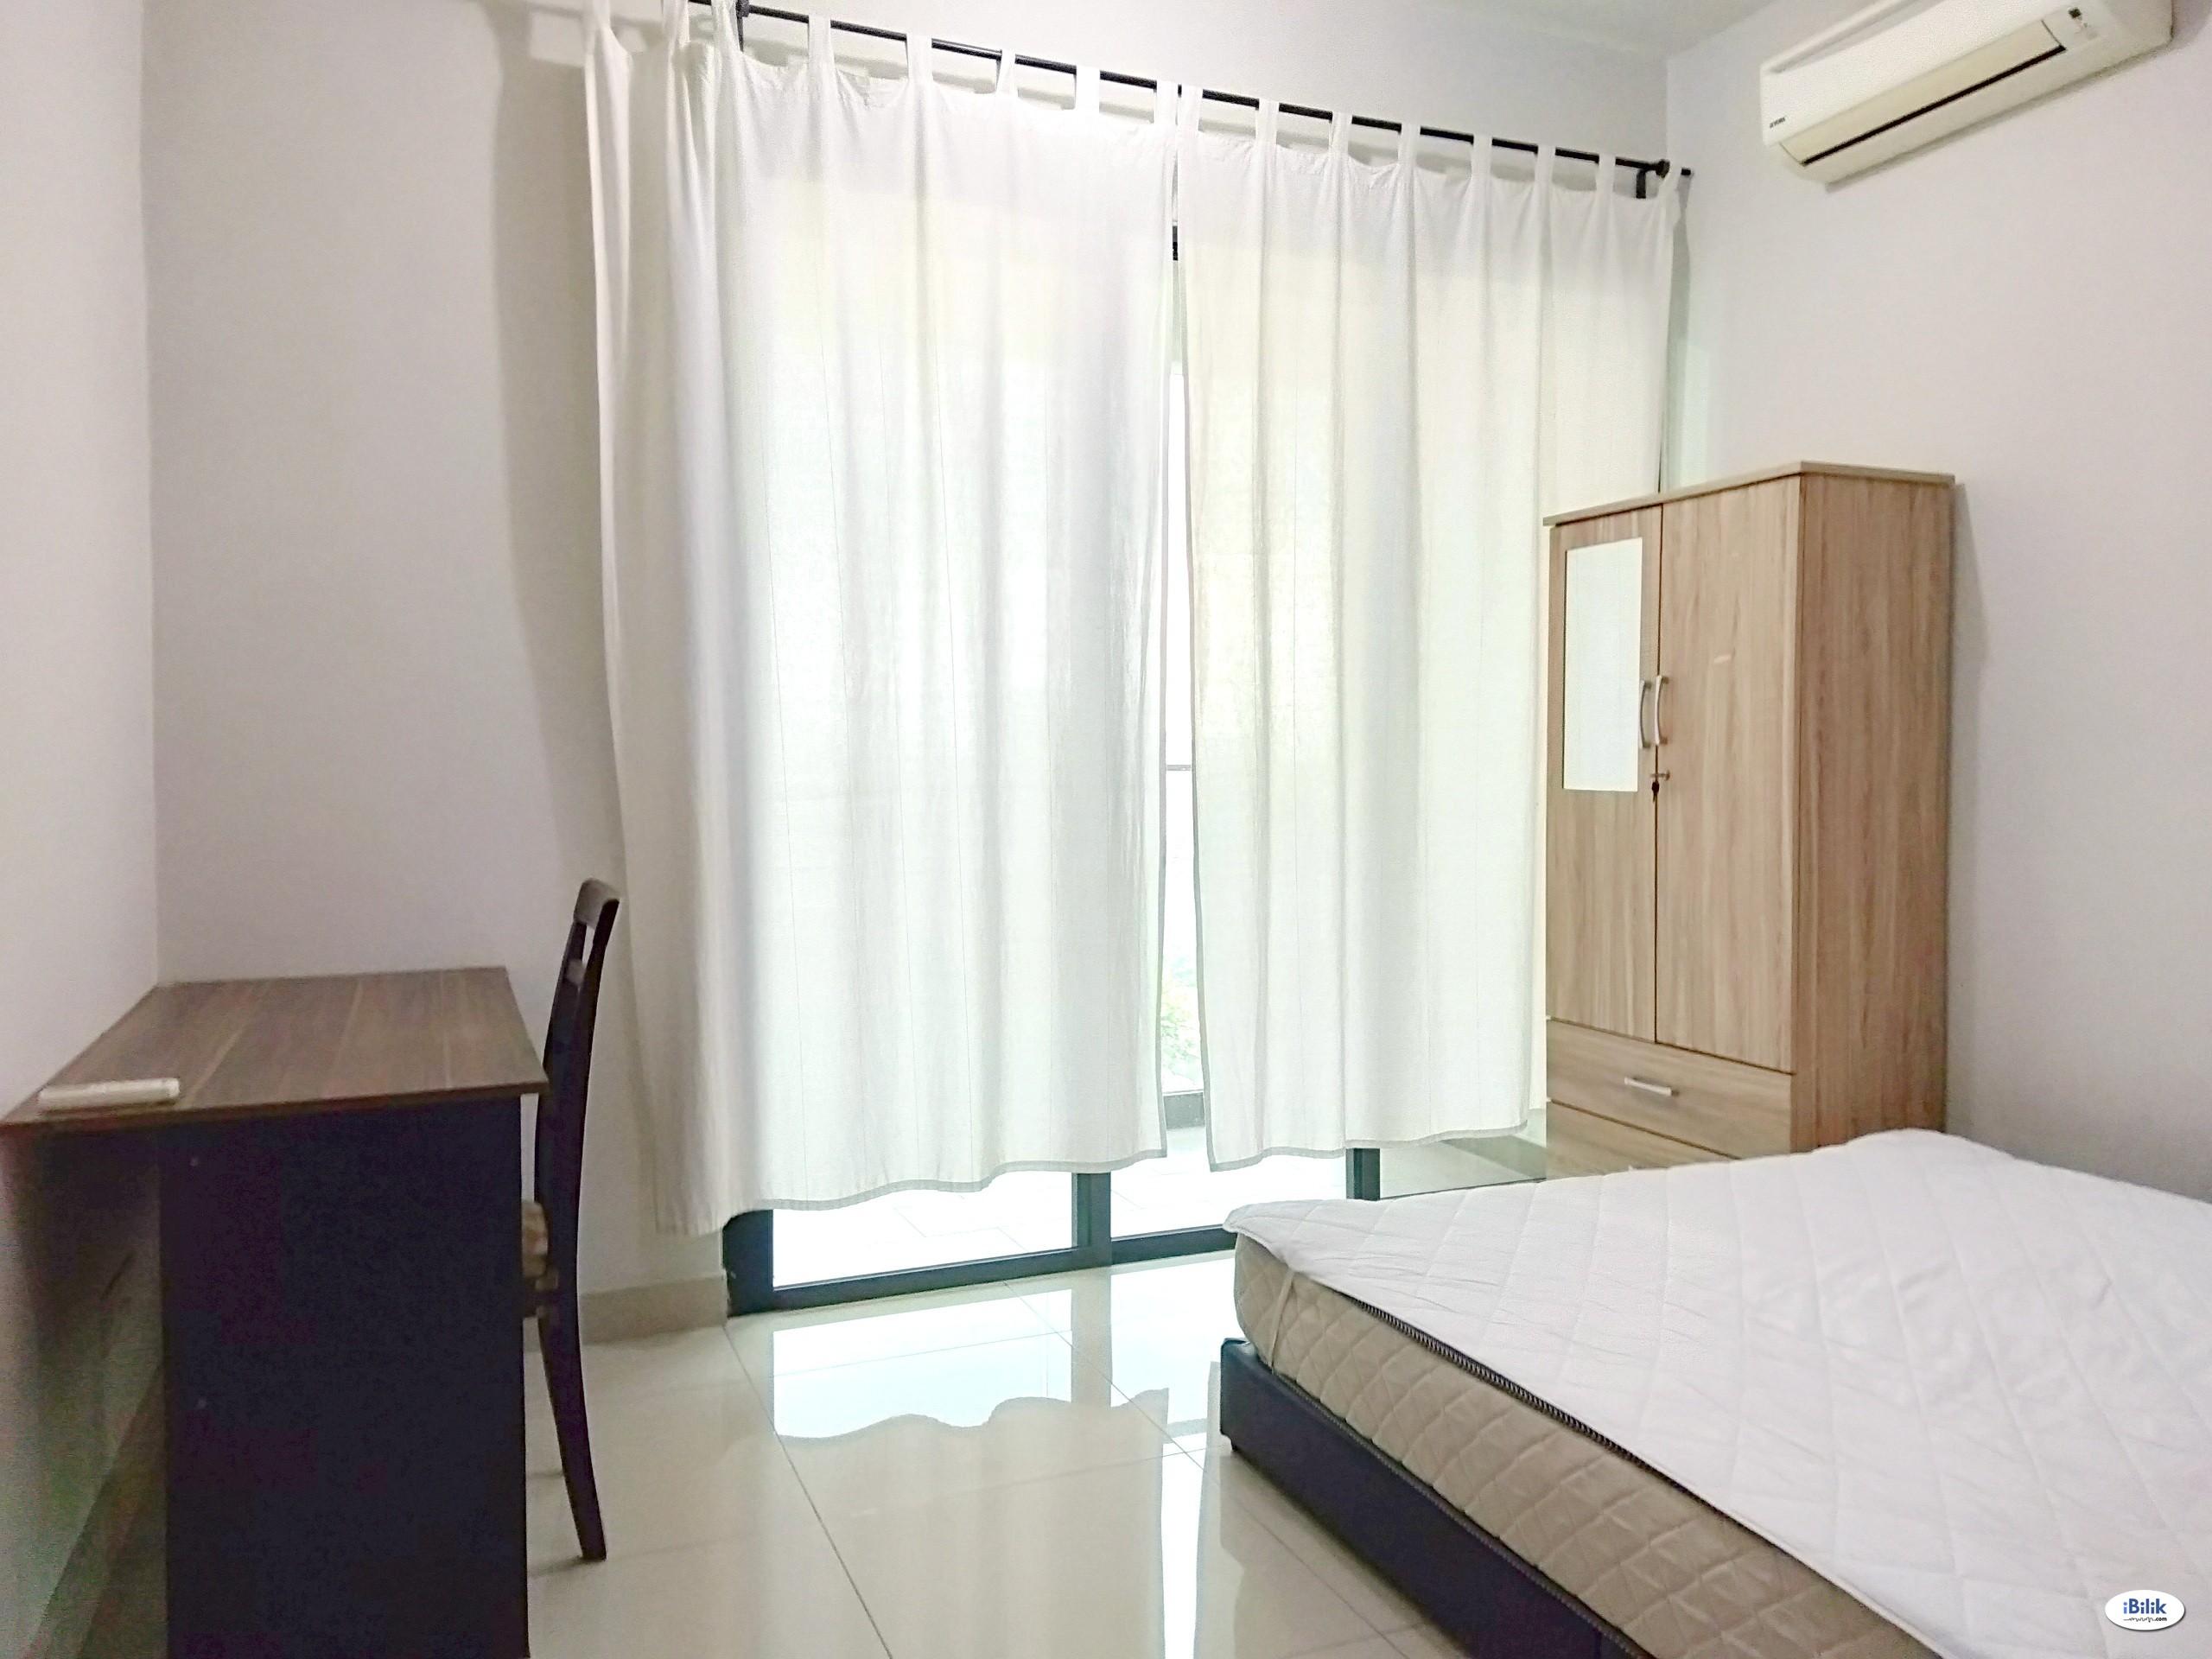 Univ 360 Place Seri Kembangan Fully Furnished Balcony Room For Rent, Nearby Taman Bukit Serdang Jaya, The Mines